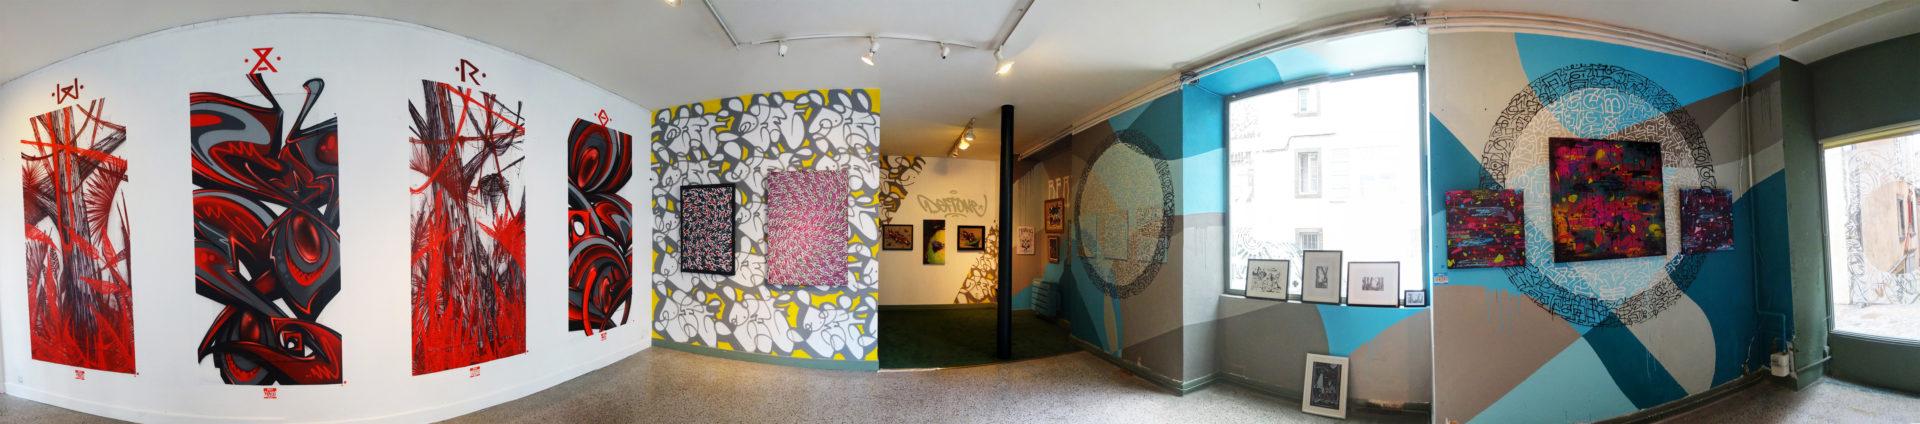 Deft - Exposition ENDtoEND - Street-Art - Rue Savaron Clermont-Ferrand